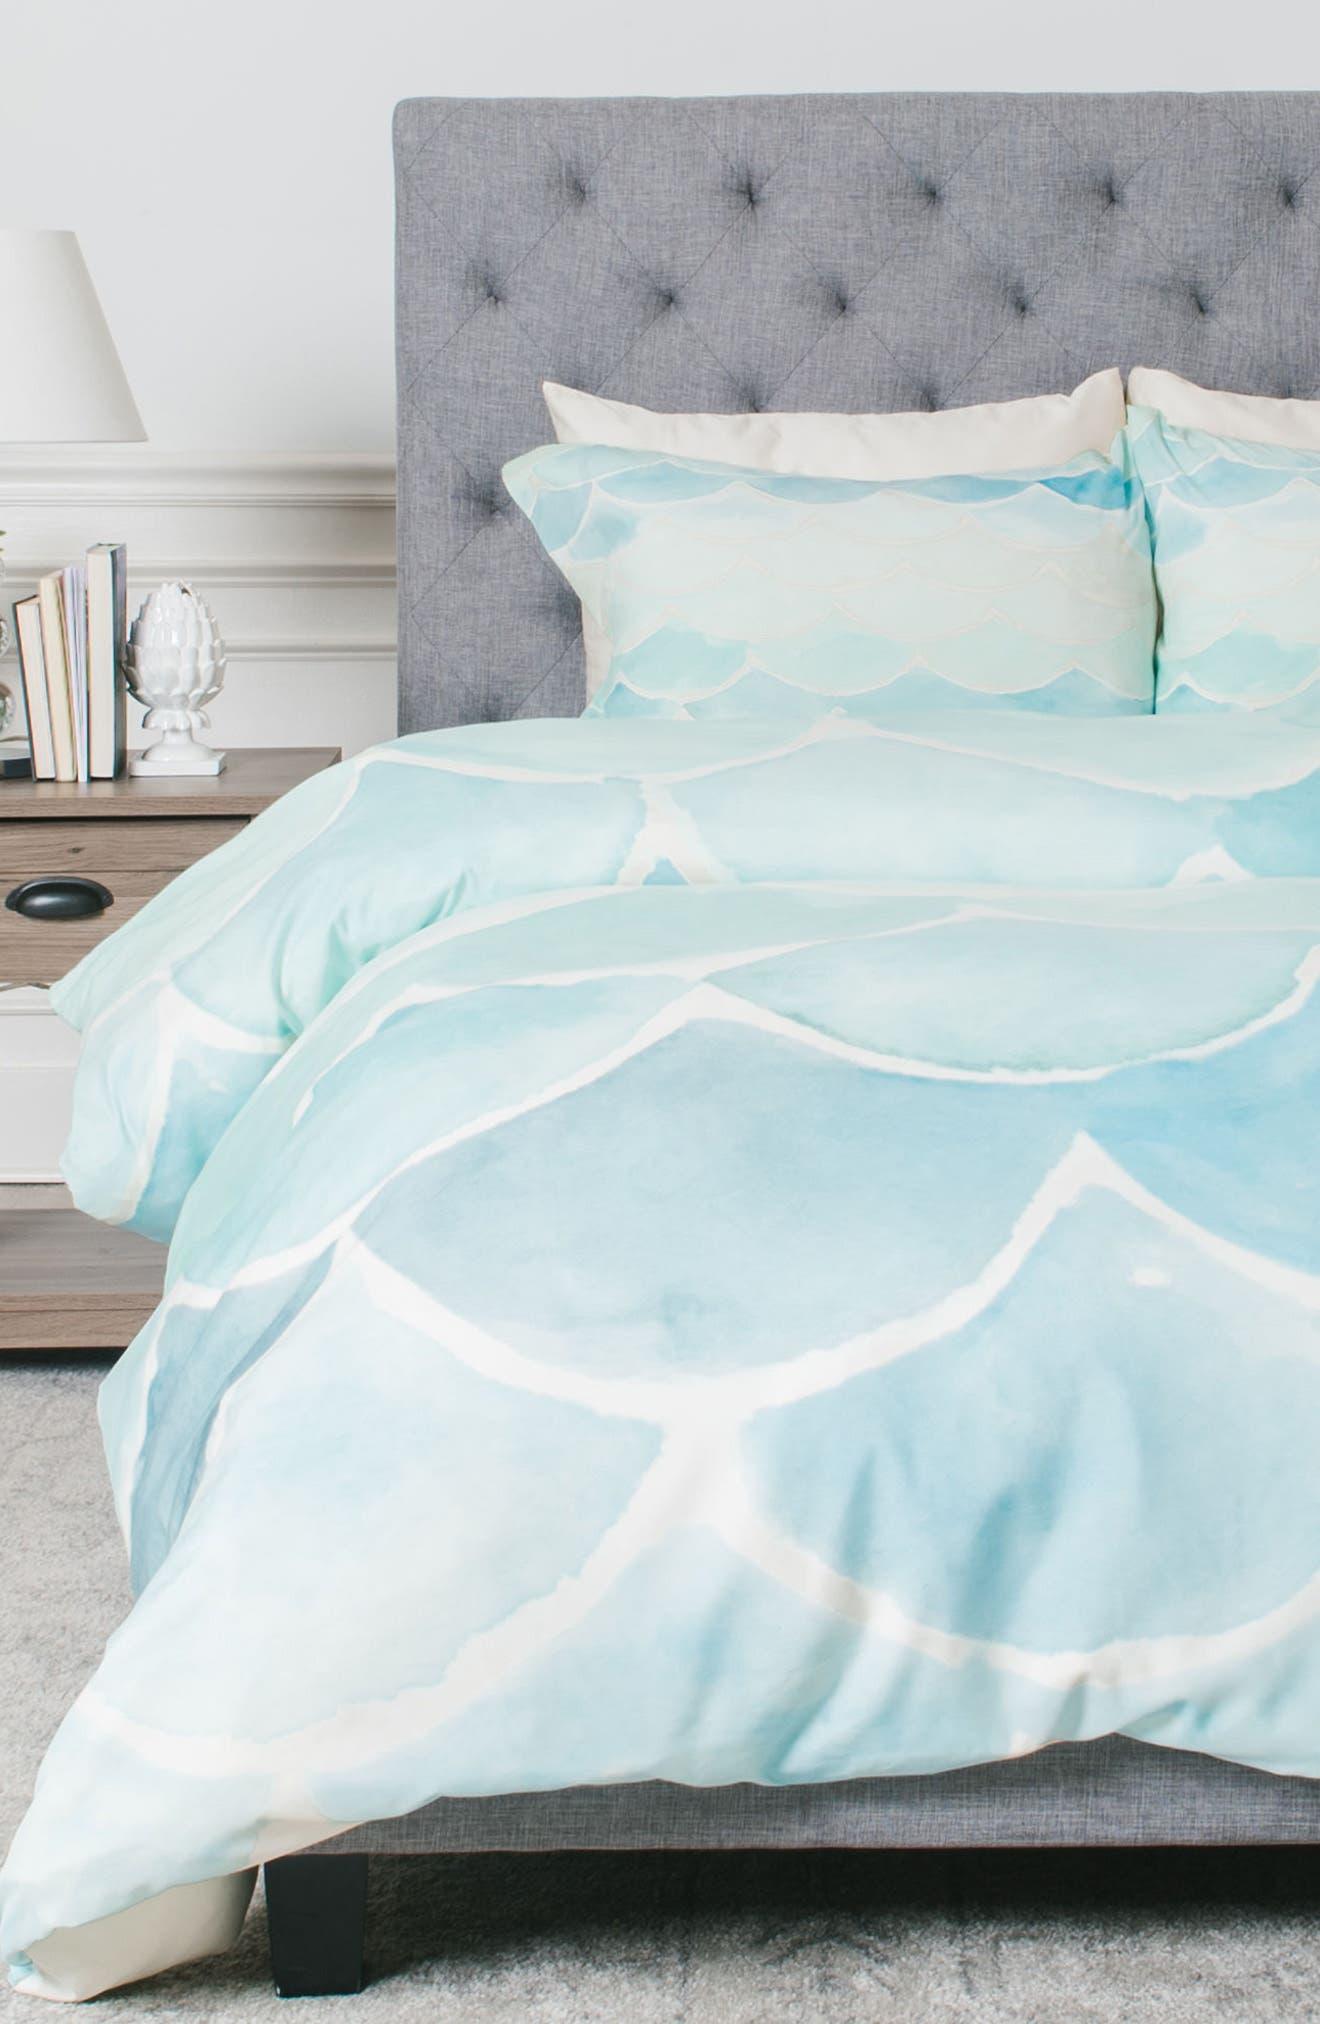 Alternate Image 1 Selected - DENY Designs Mermaid Scales Duvet Cover & Sham Set